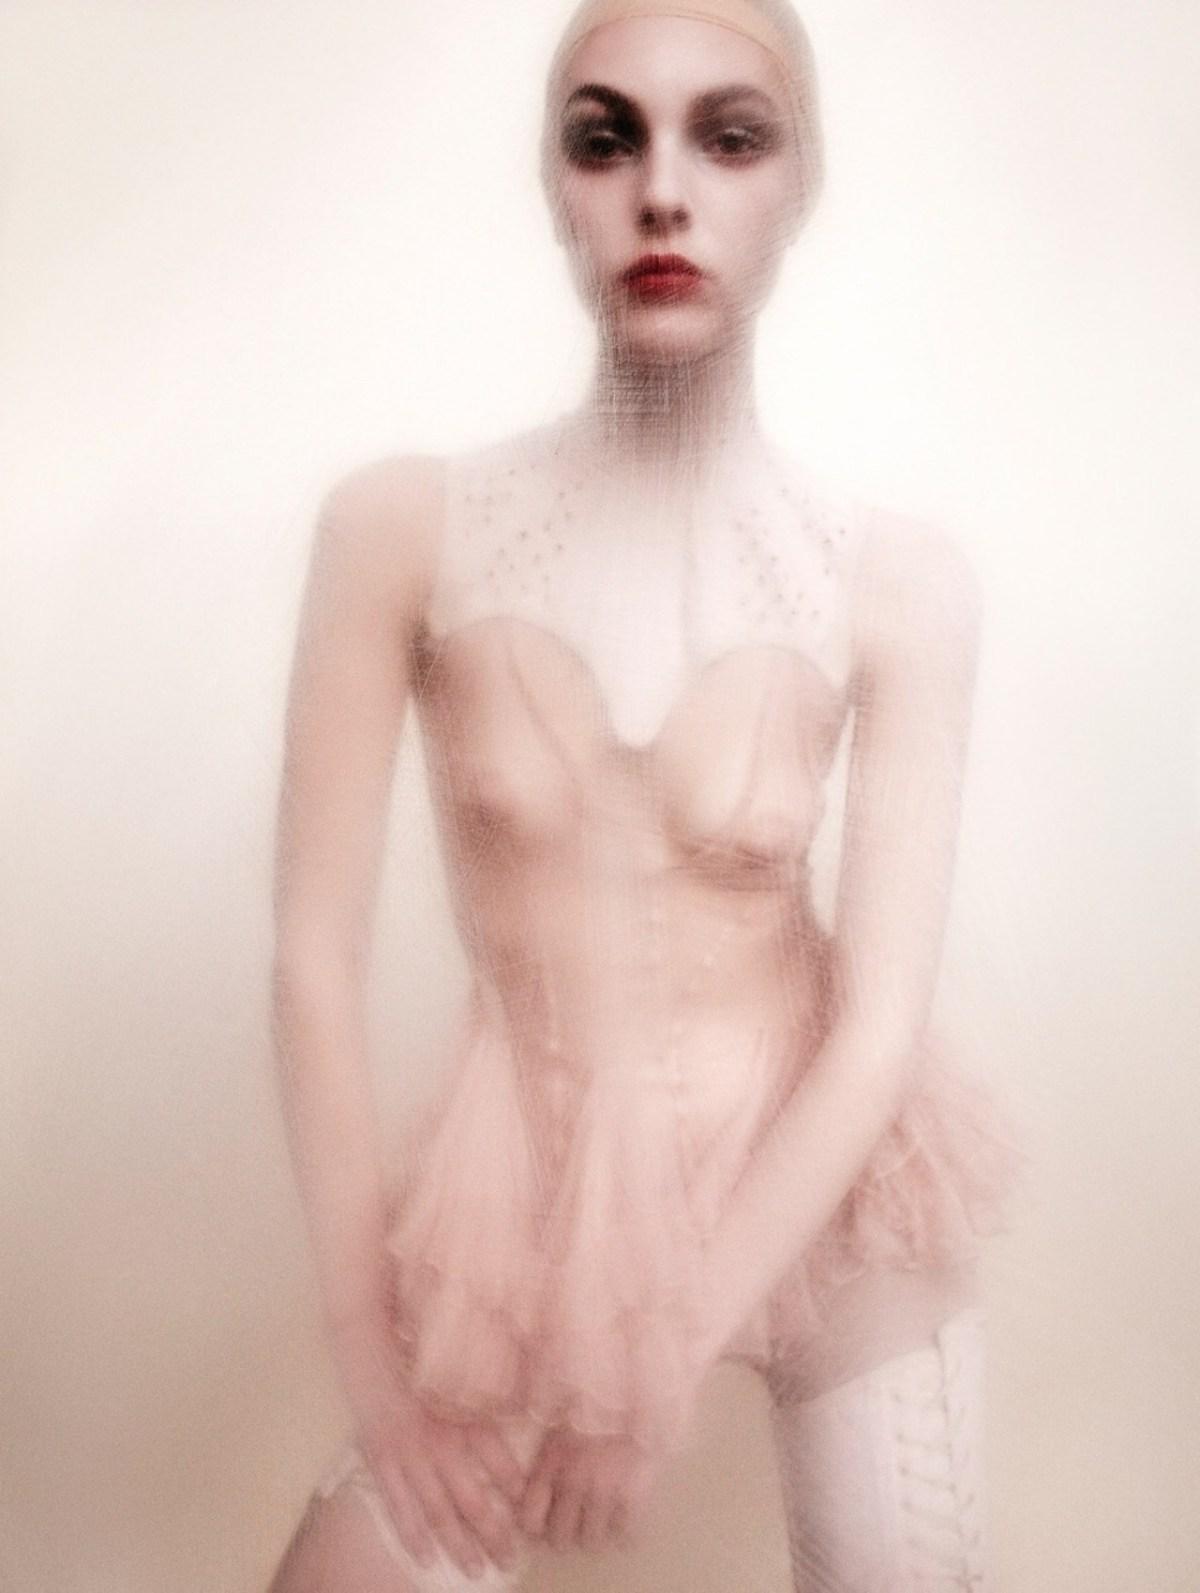 Vittoria Ceretti by Luigi Murenu and Iango Henzi for Exhibition Magazine